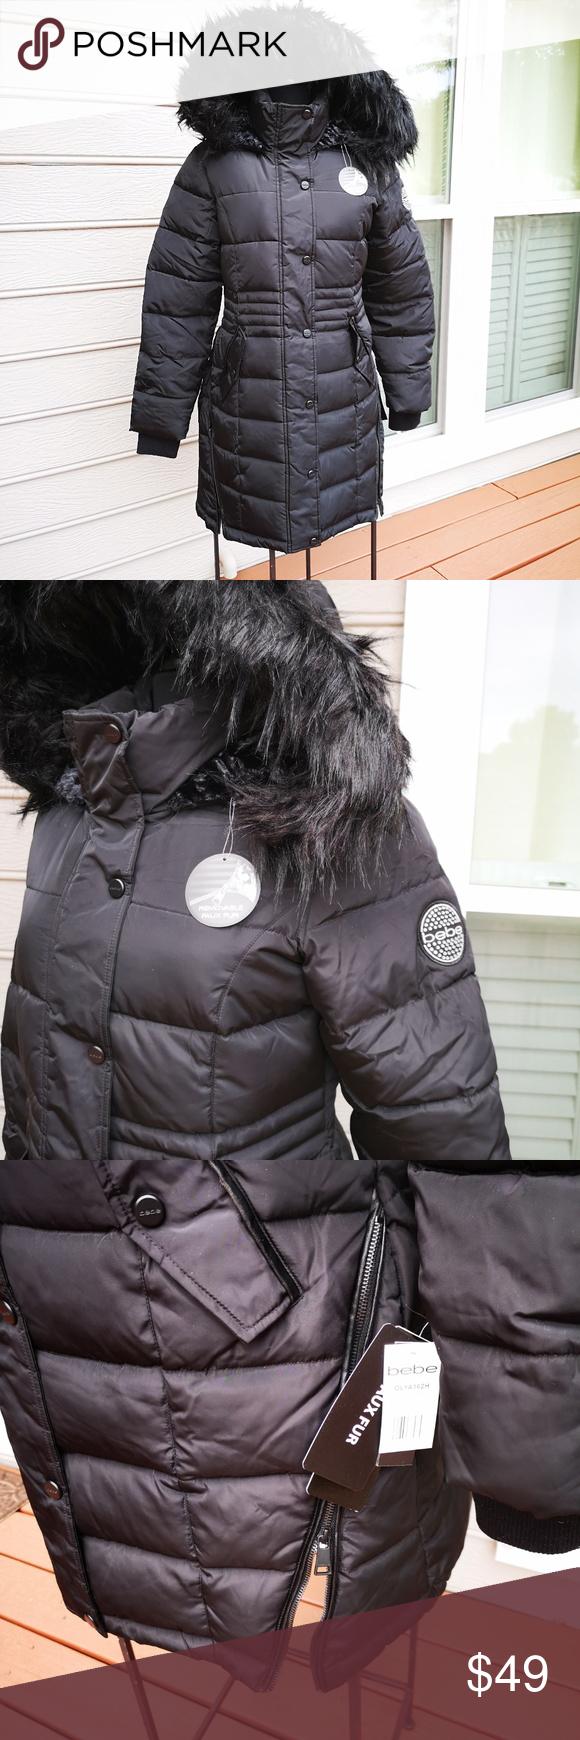 Bebe Women Midweight Fur Puffer Jacket Sherpa Line Sherpa Lined Puffer Jackets Bebe [ 1740 x 580 Pixel ]